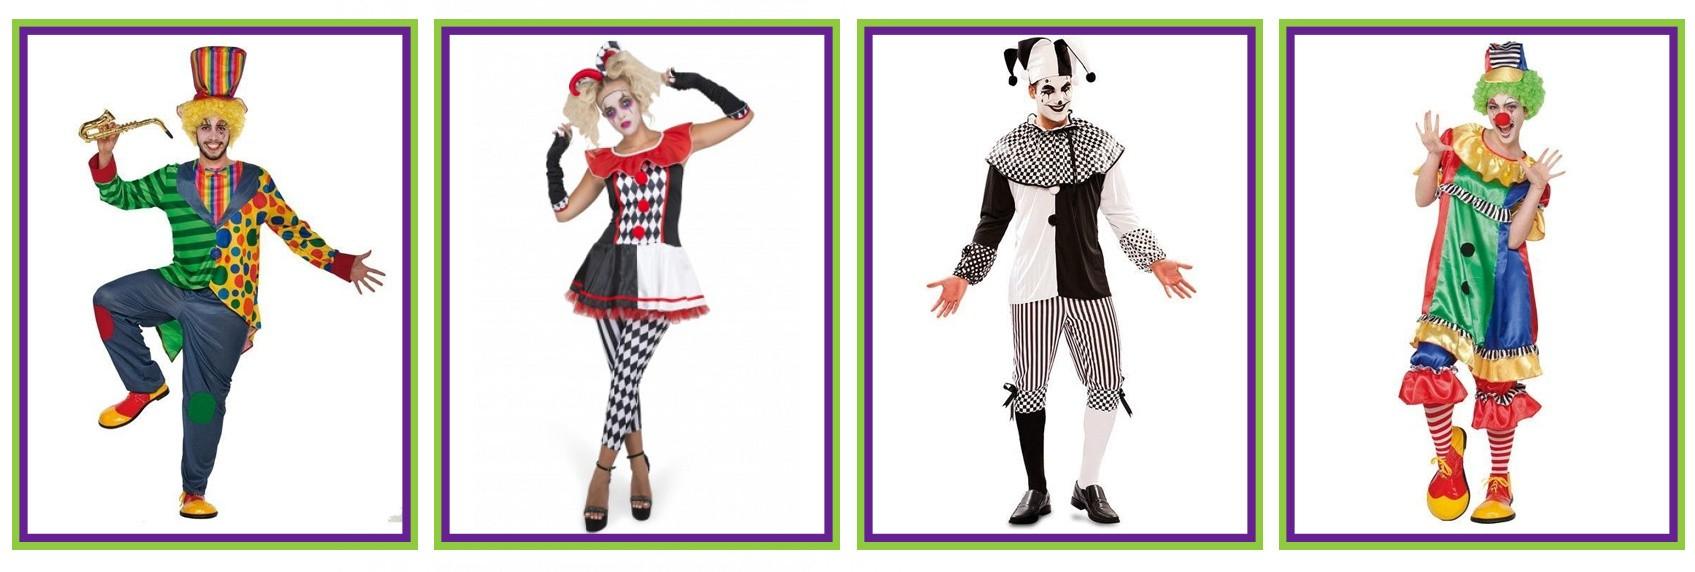 2237757279-CoenSander_budget-clown-kostuum.jpg